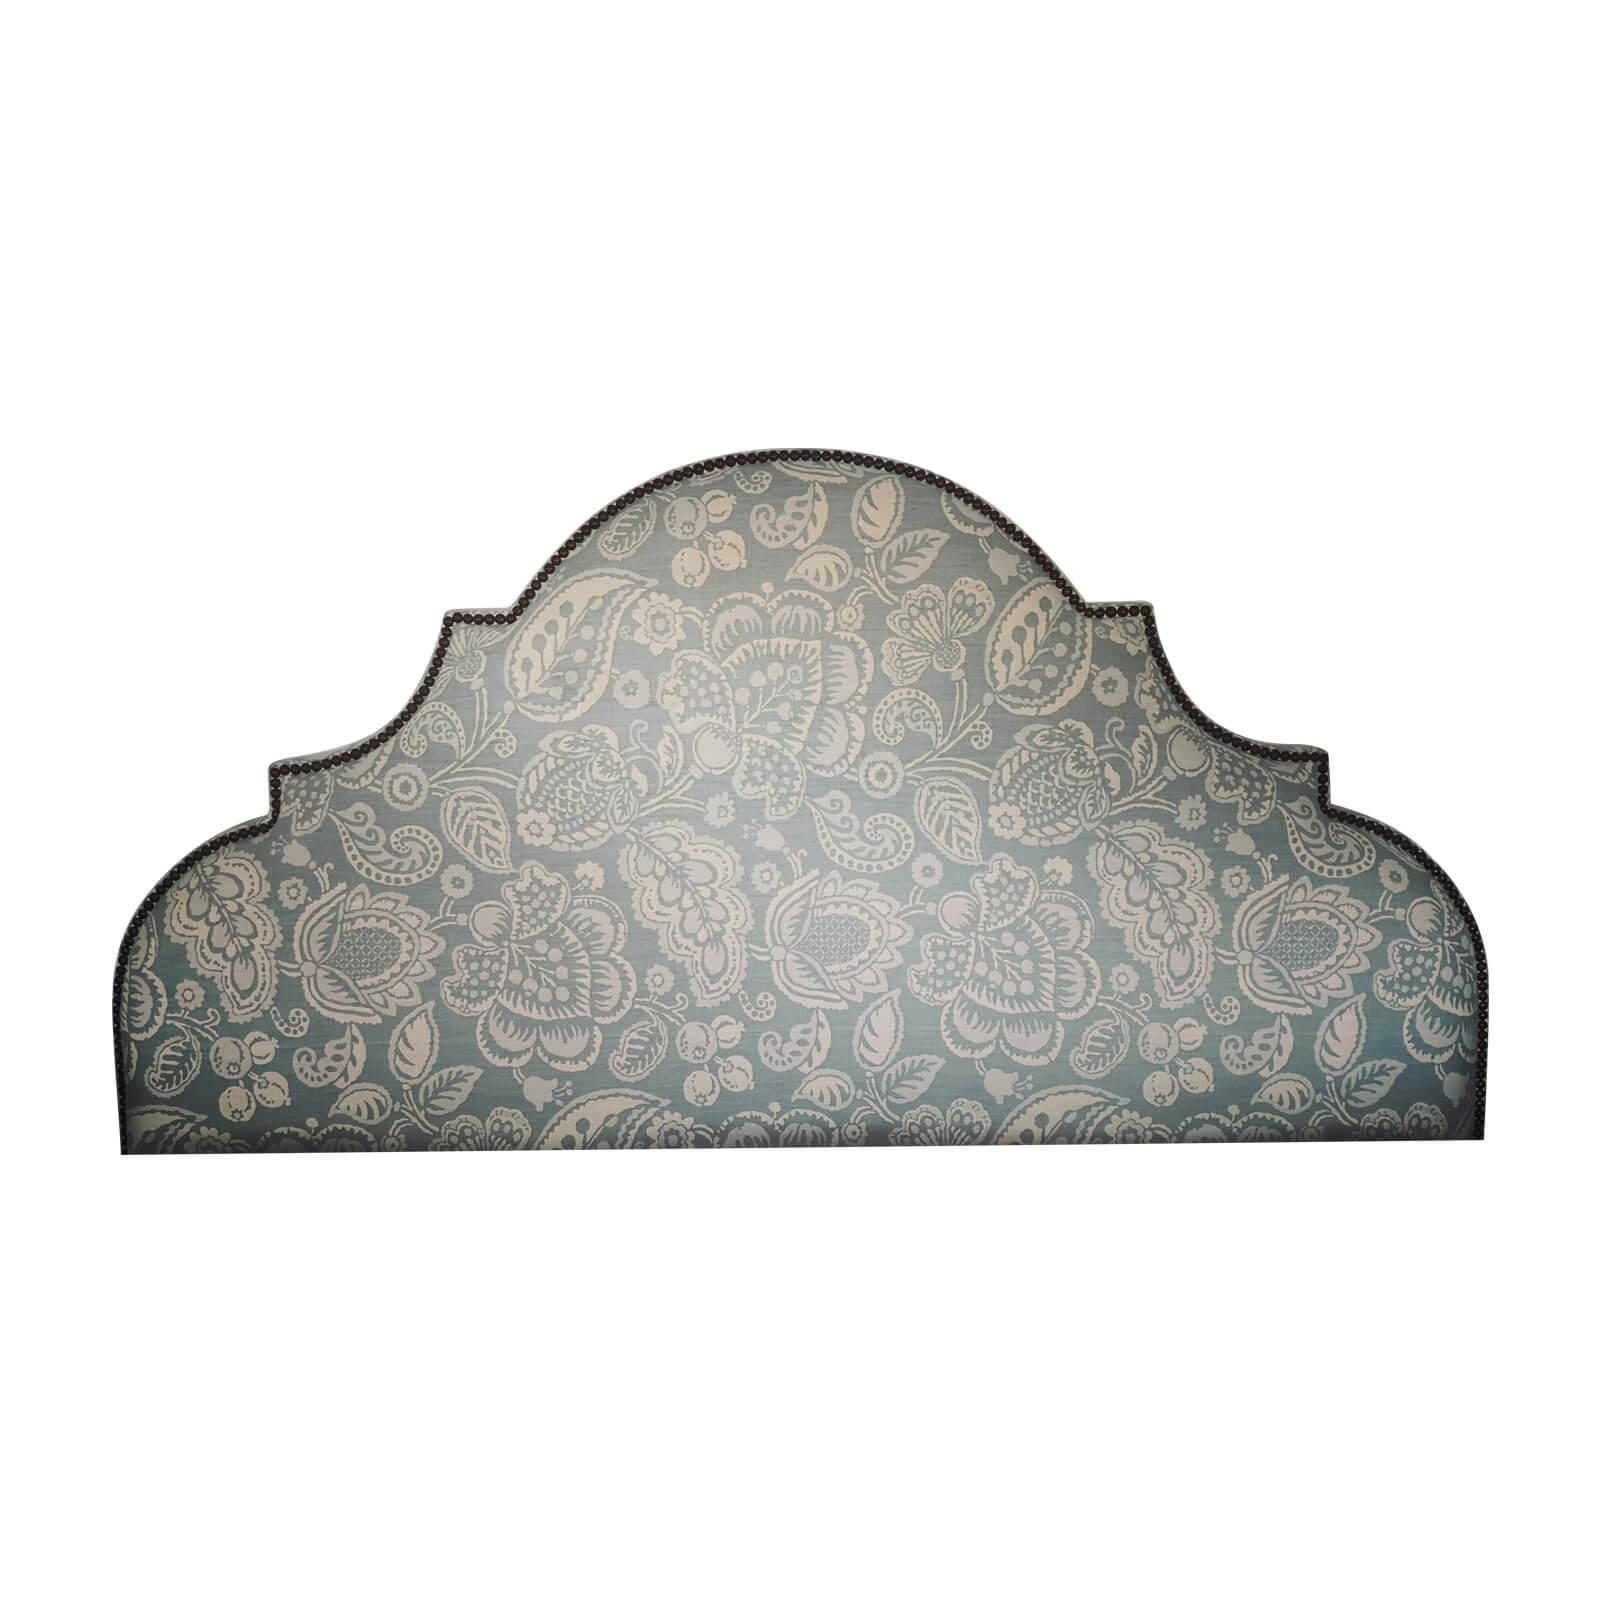 Custom Upholstered KB Bedhead & Valance